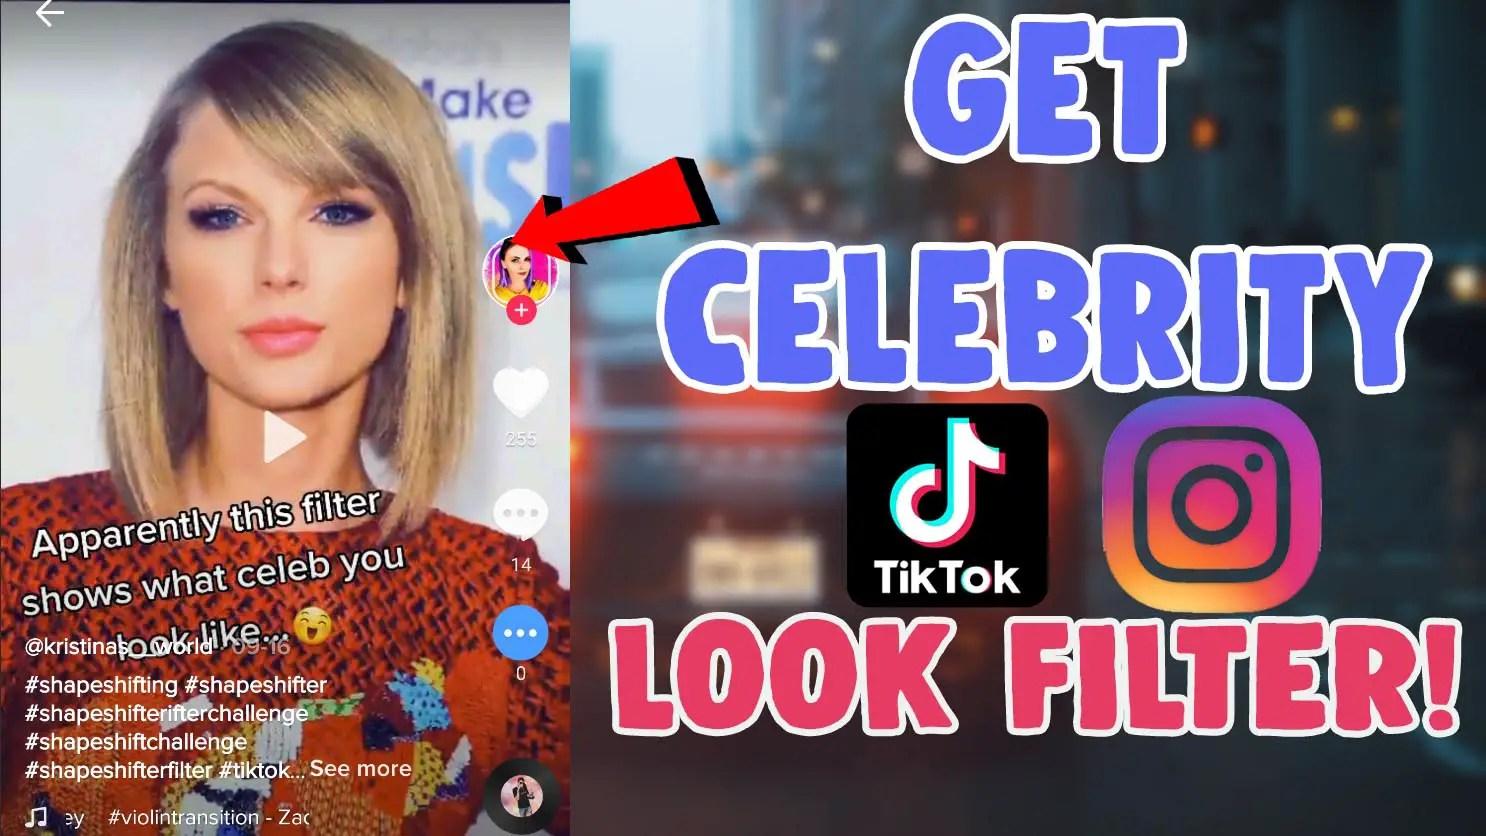 how to get celebrity look alike filter on tiktok shapeshifting effect